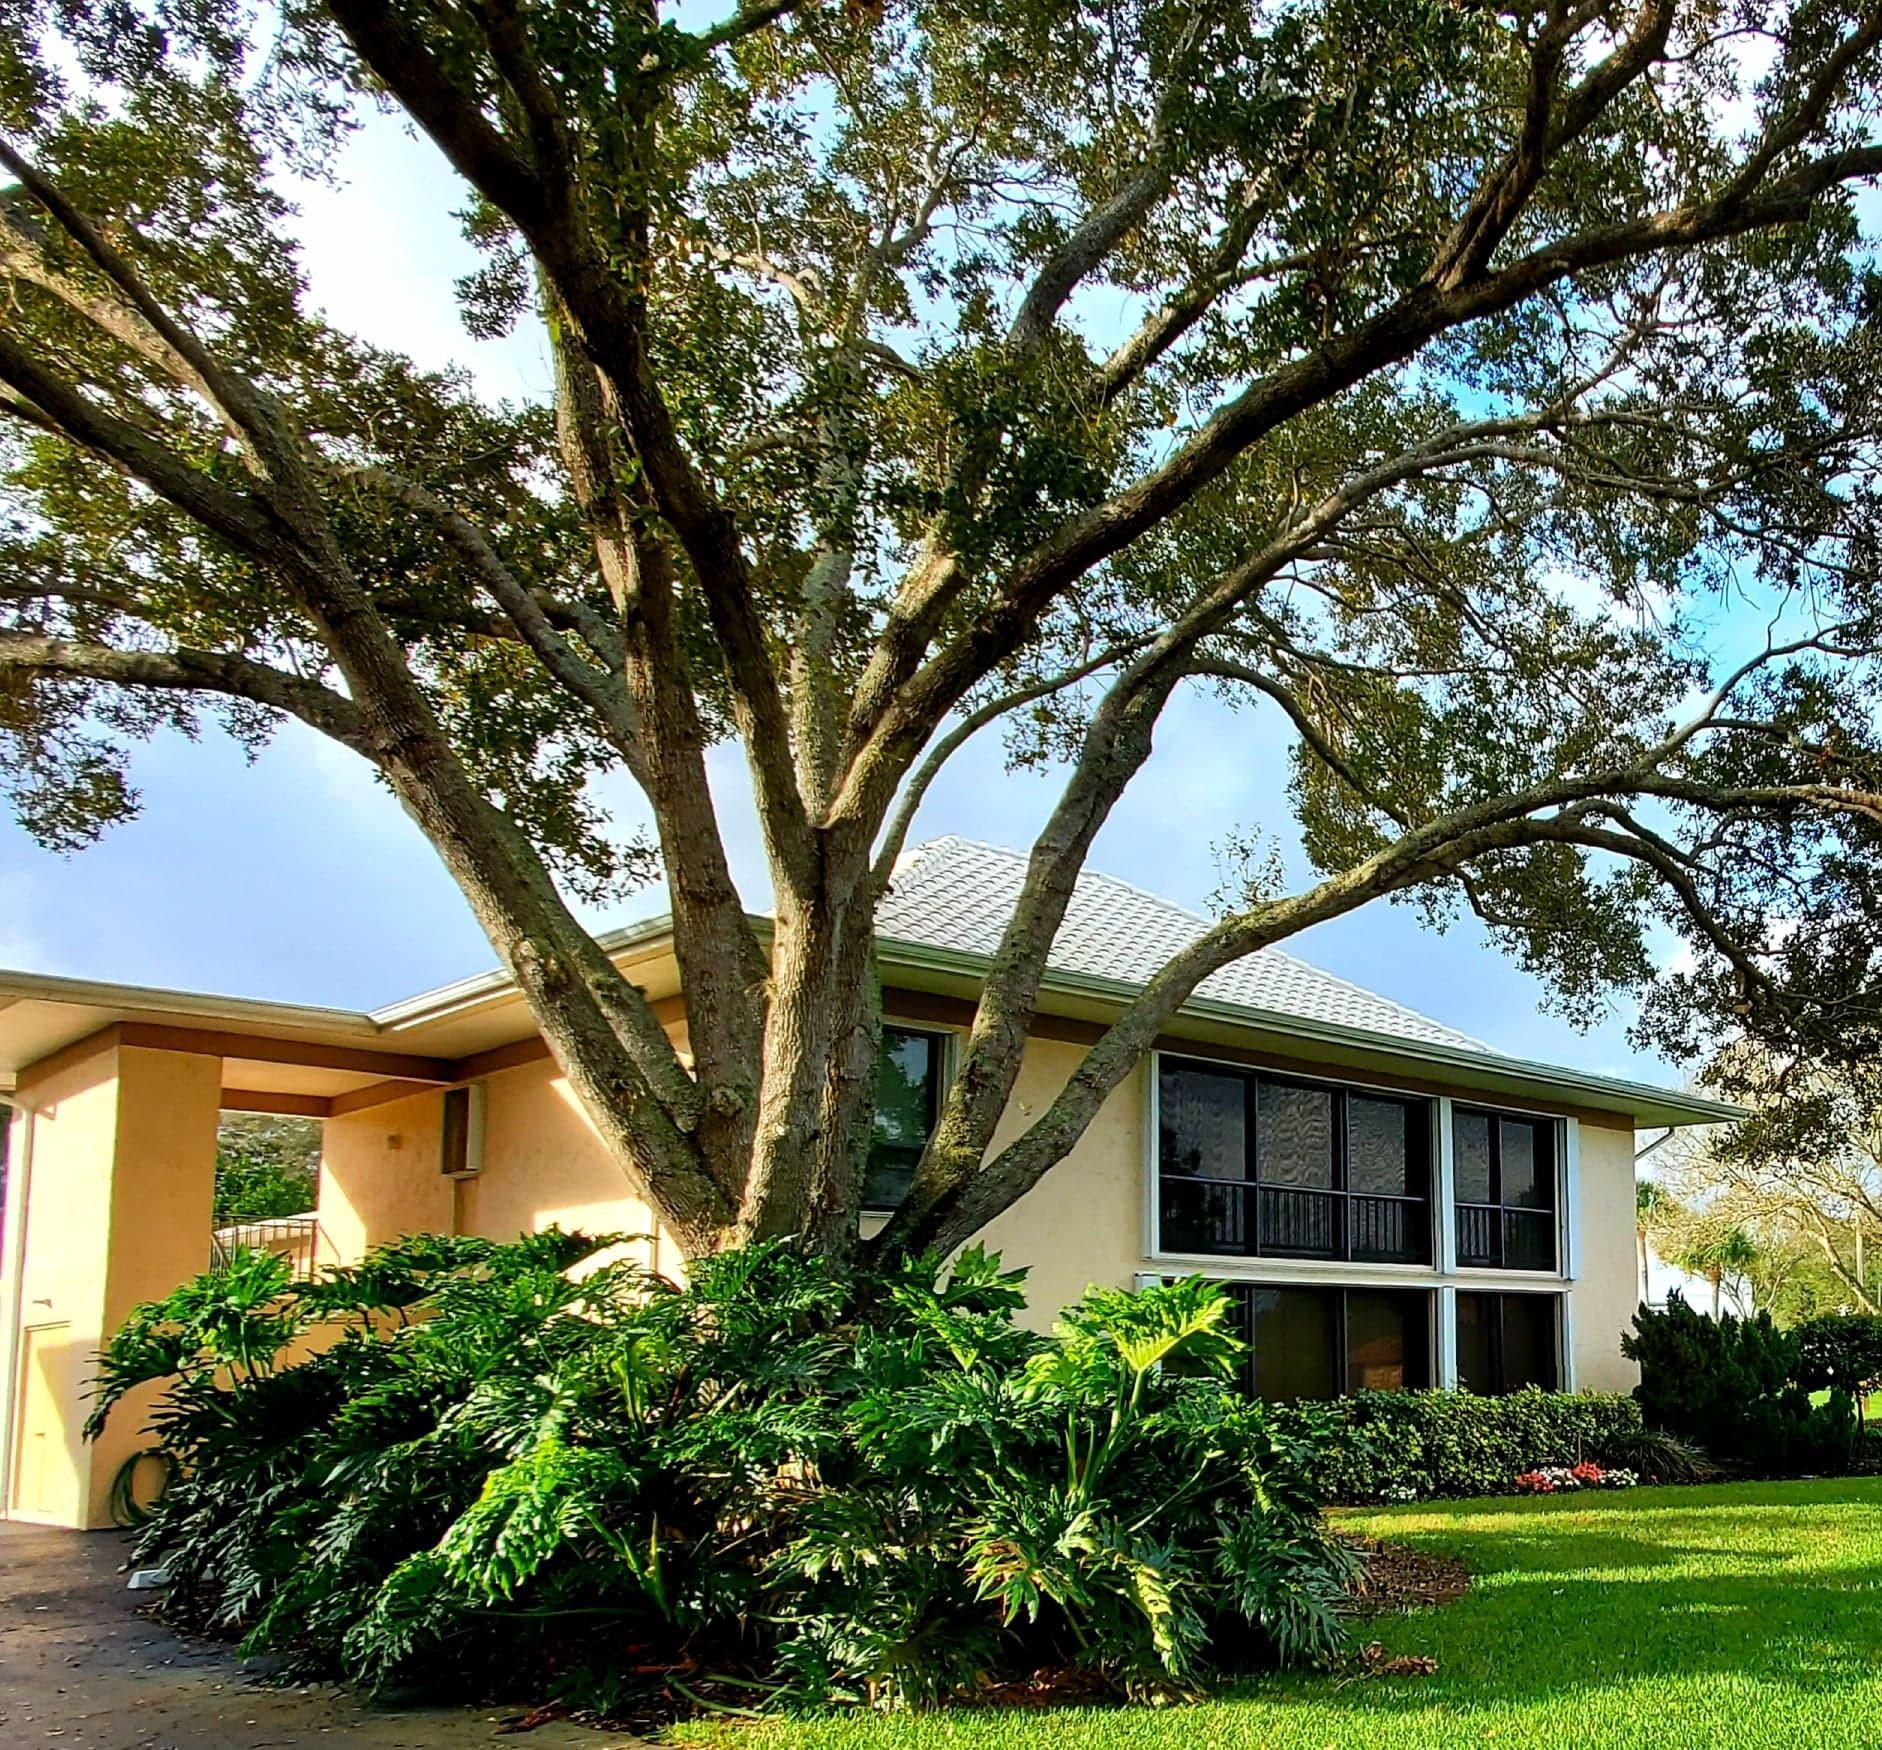 16 Turtle Creek Drive 16-A, Tequesta, Florida 33469, 3 Bedrooms Bedrooms, ,2 BathroomsBathrooms,F,Condominium,Turtle Creek,RX-10593069